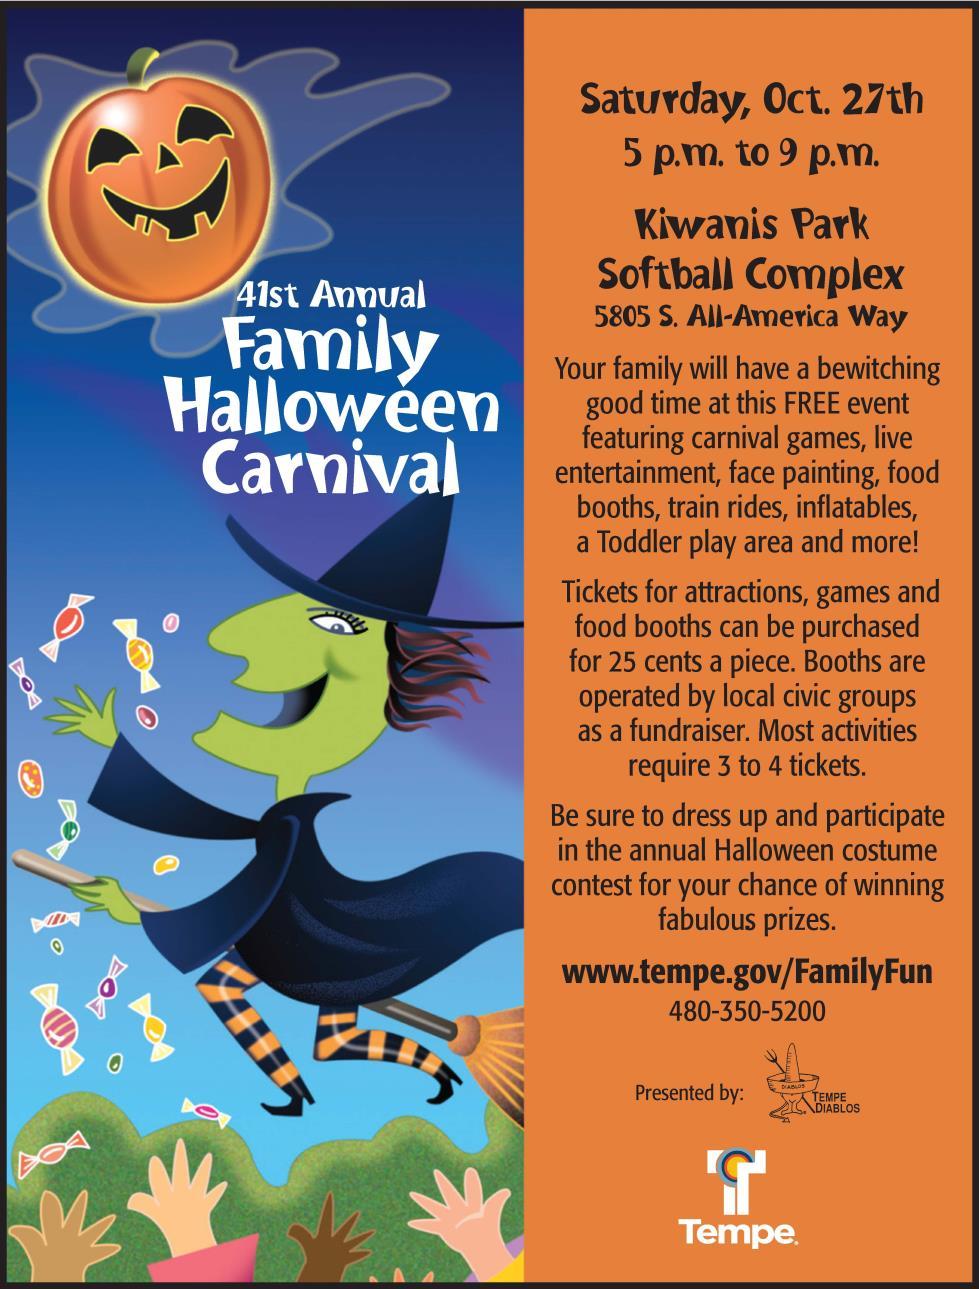 family halloween carnival at kiwanis park